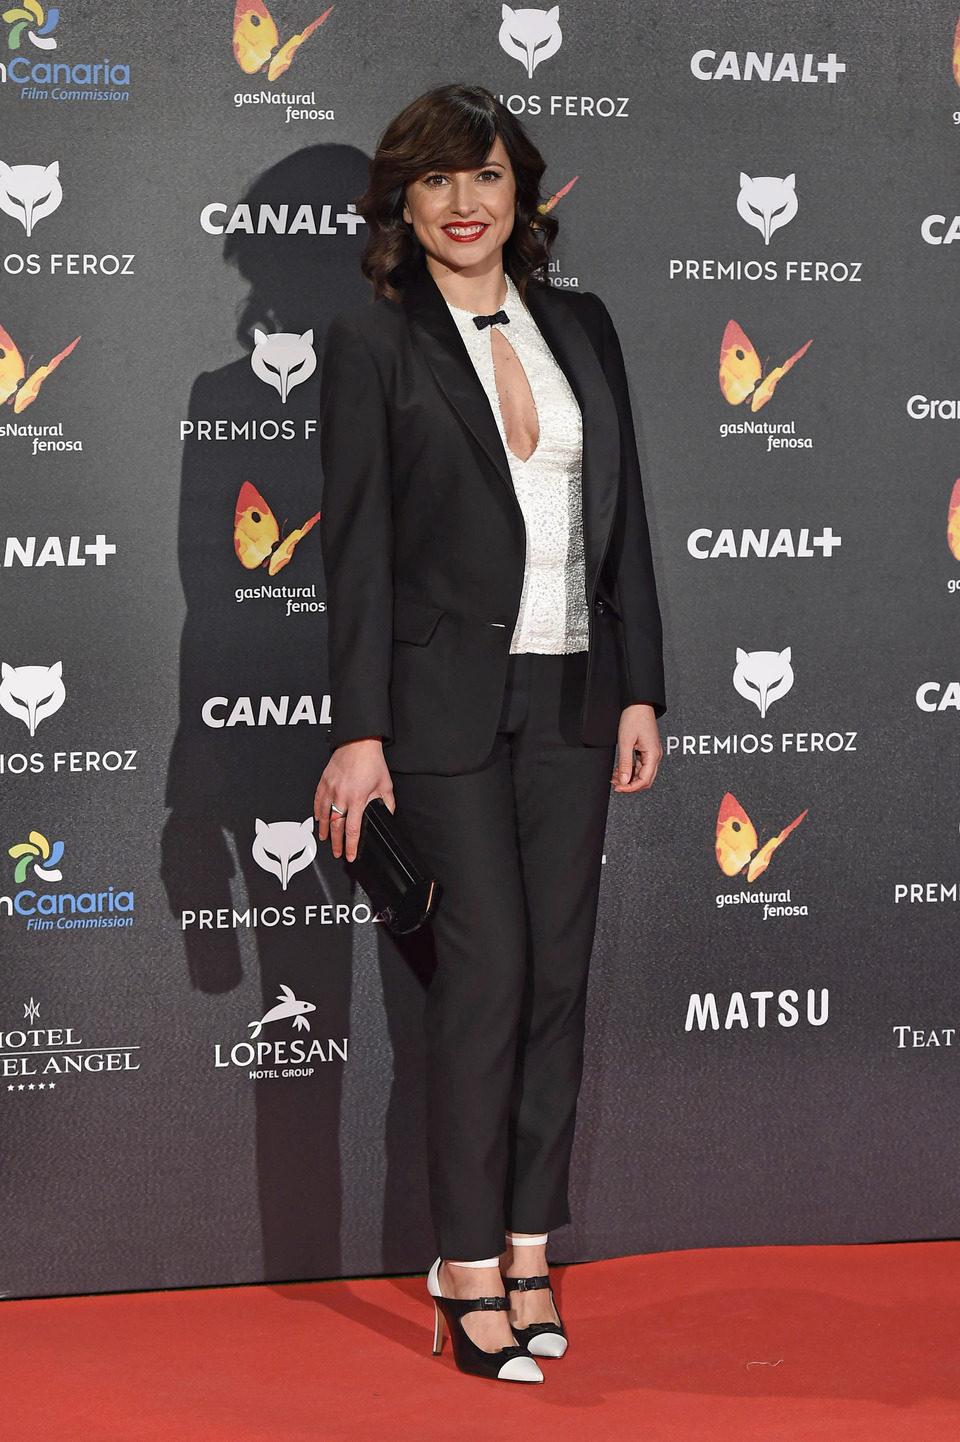 Marian Álvarez en los Premios Feroz 2015